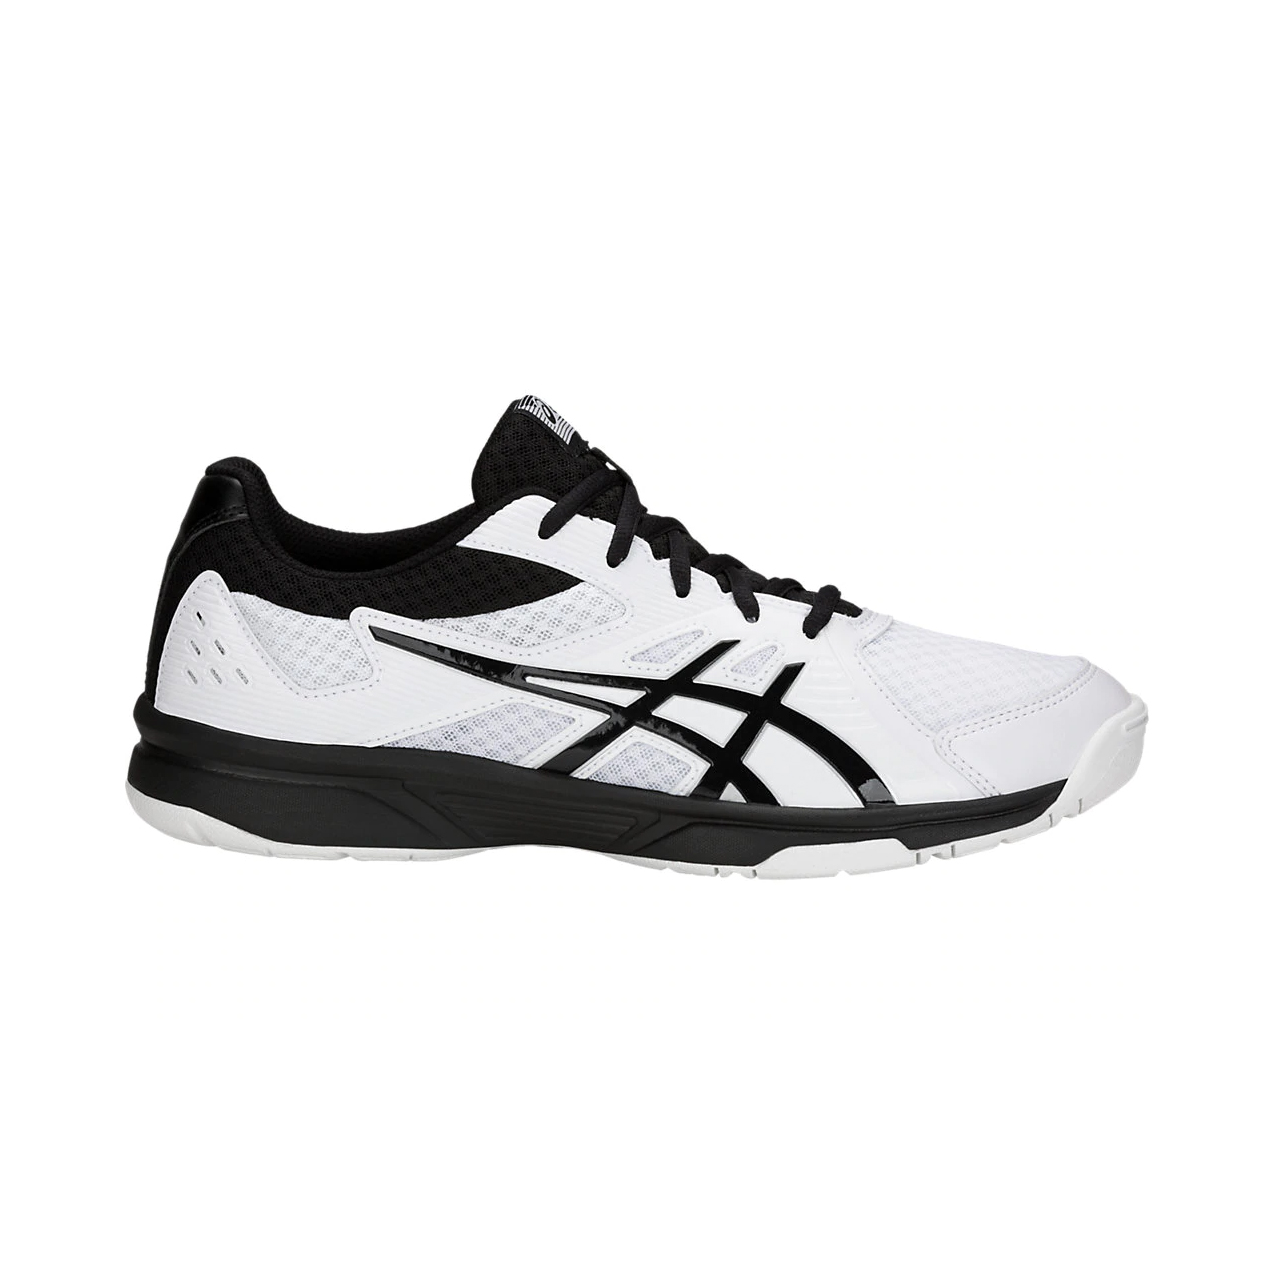 c9624d59f8 Asics Men's Upcourt 3 Indoor Court Shoes - White